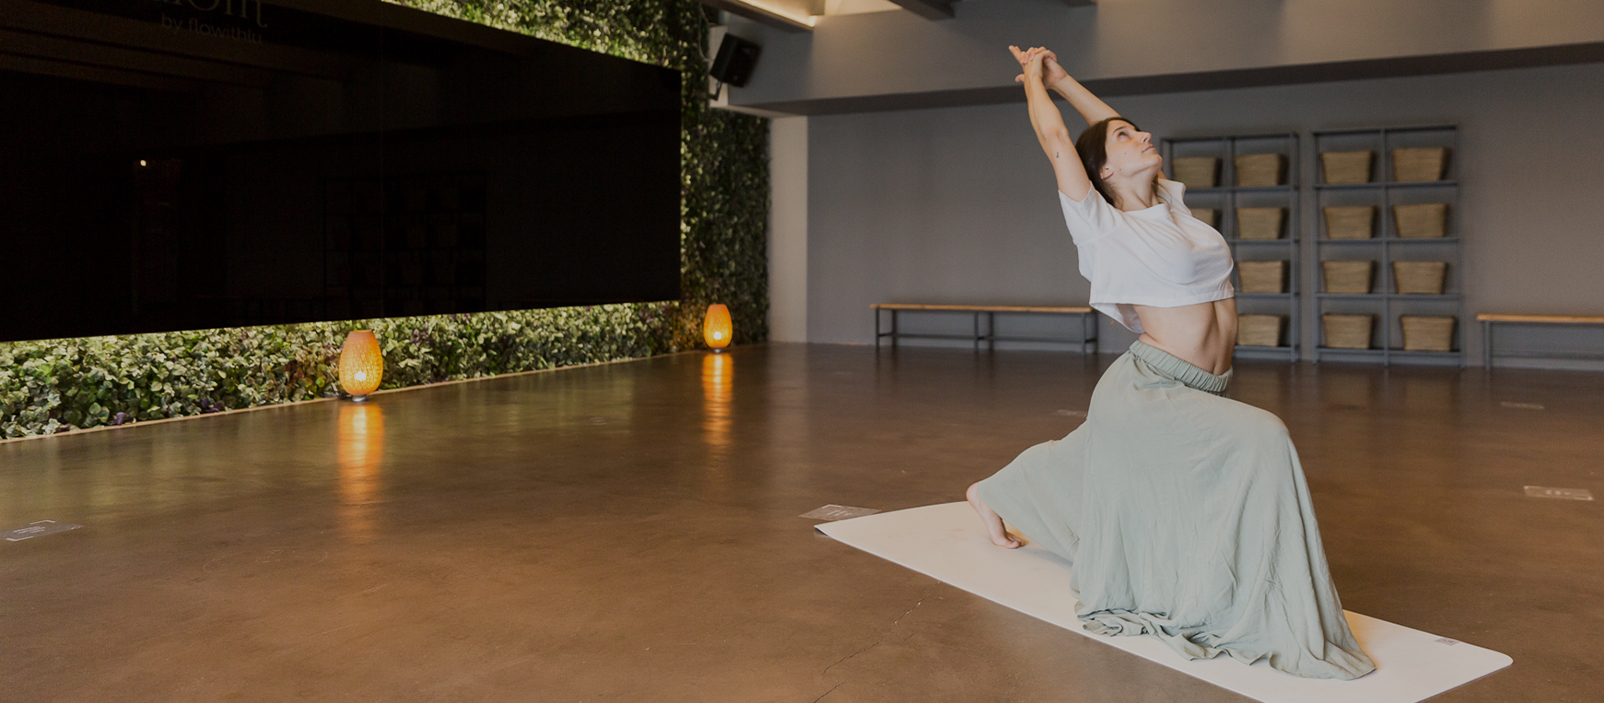 The StudiOm Yoga